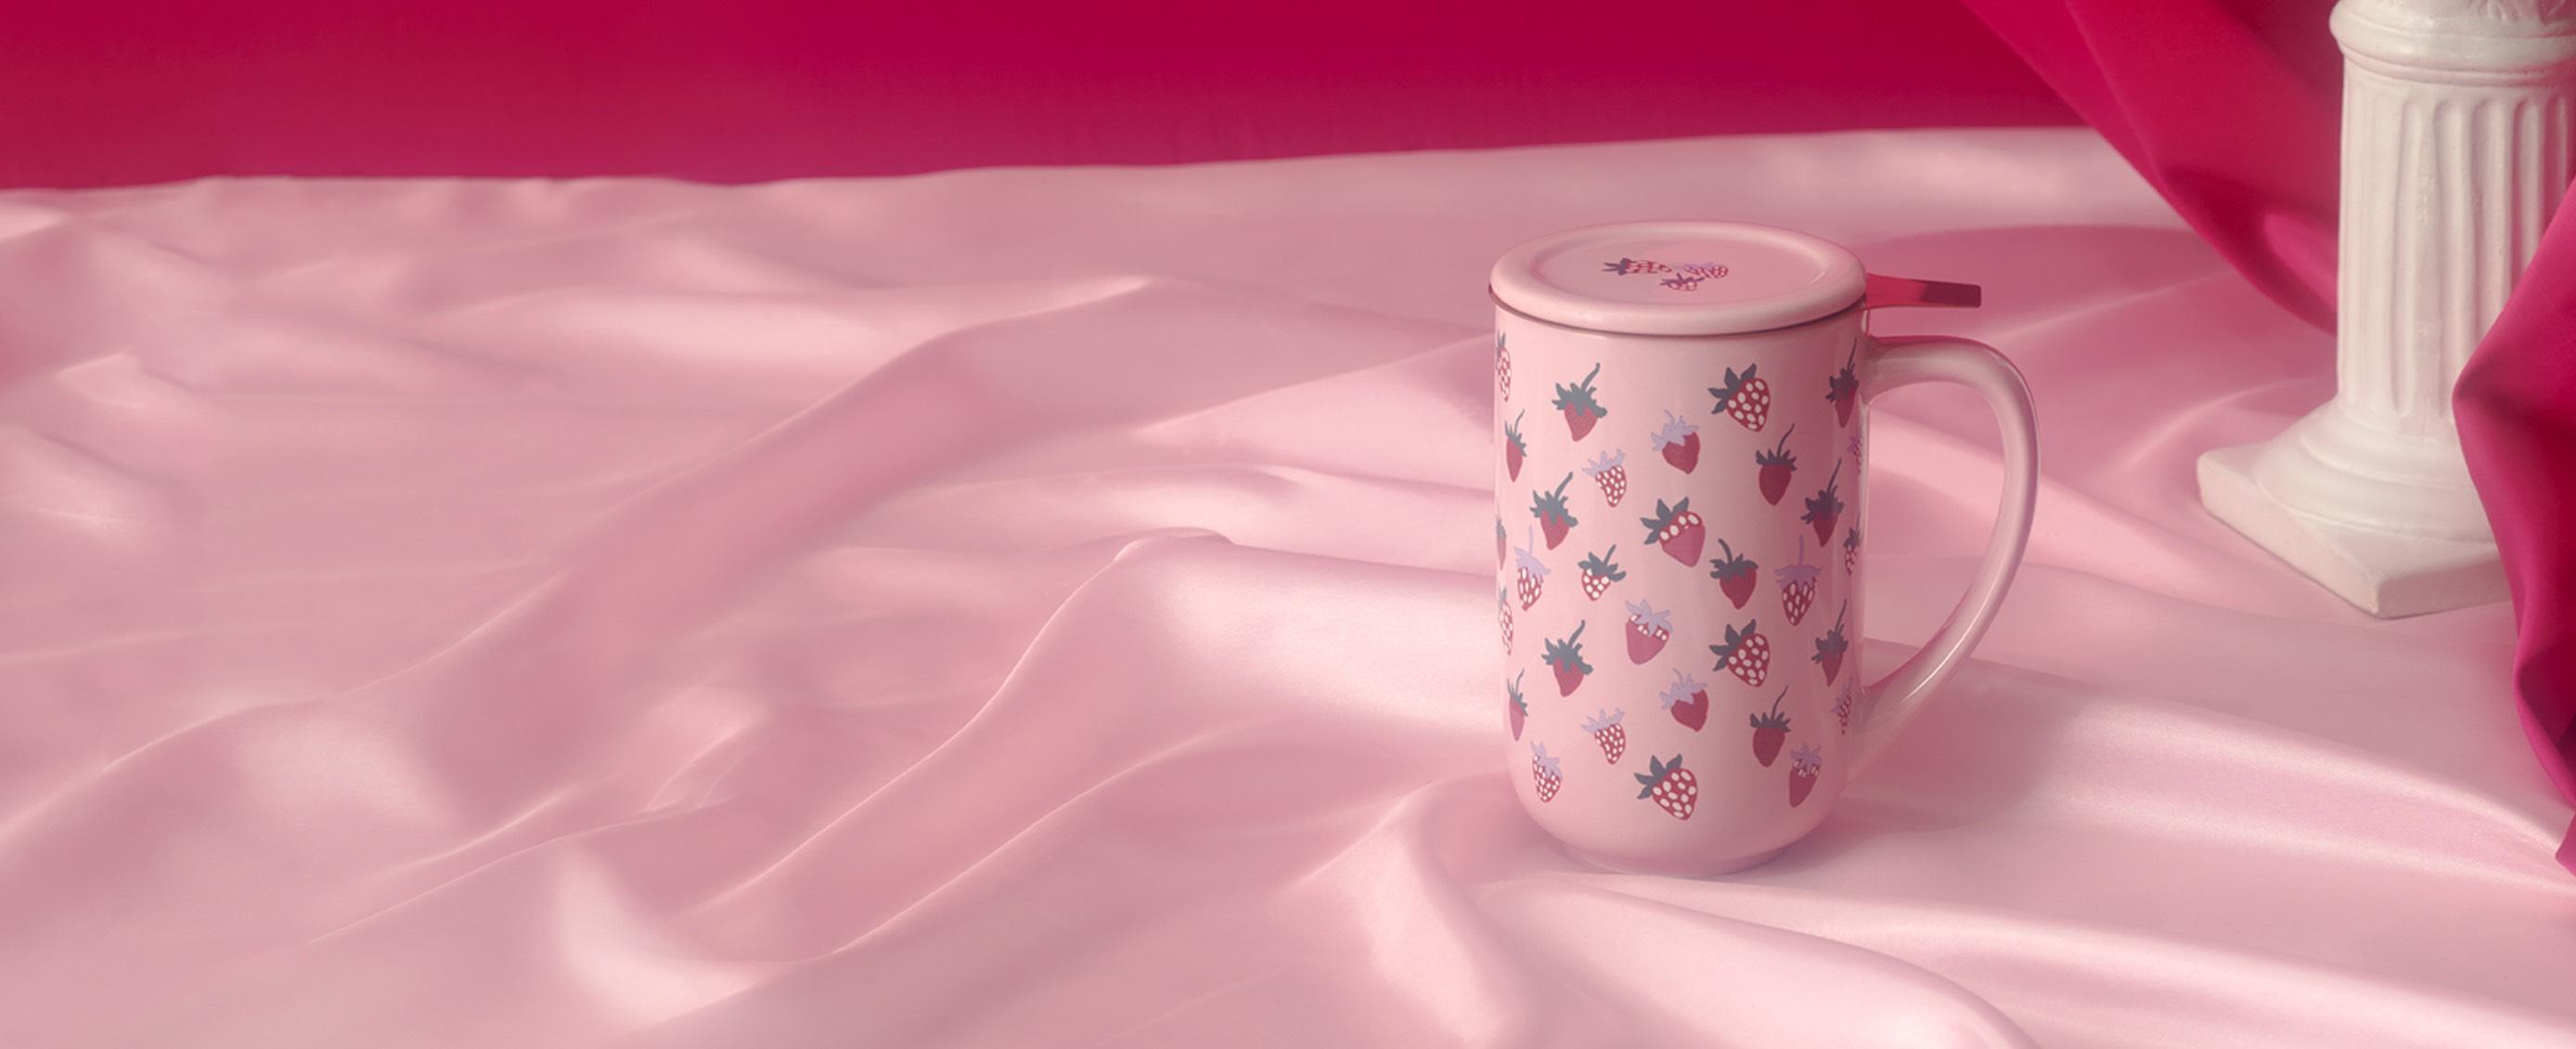 A Nordic mug with a strawberry print.